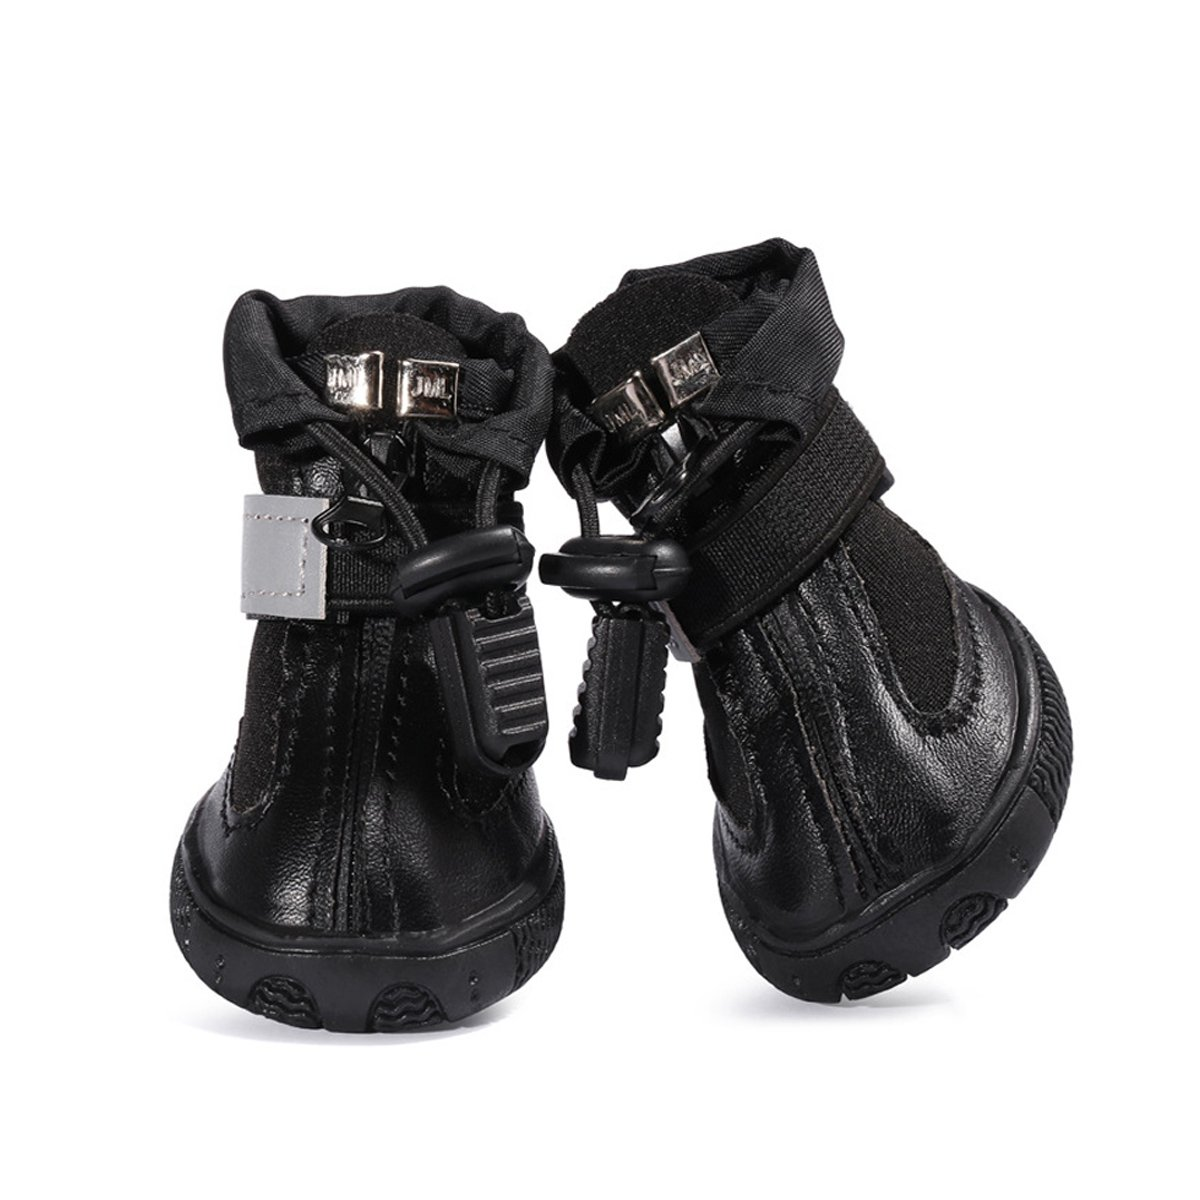 Namsan Adjustable Pet Dog Shoes Comfortable Anti-slip Waterproof for Daily Walking